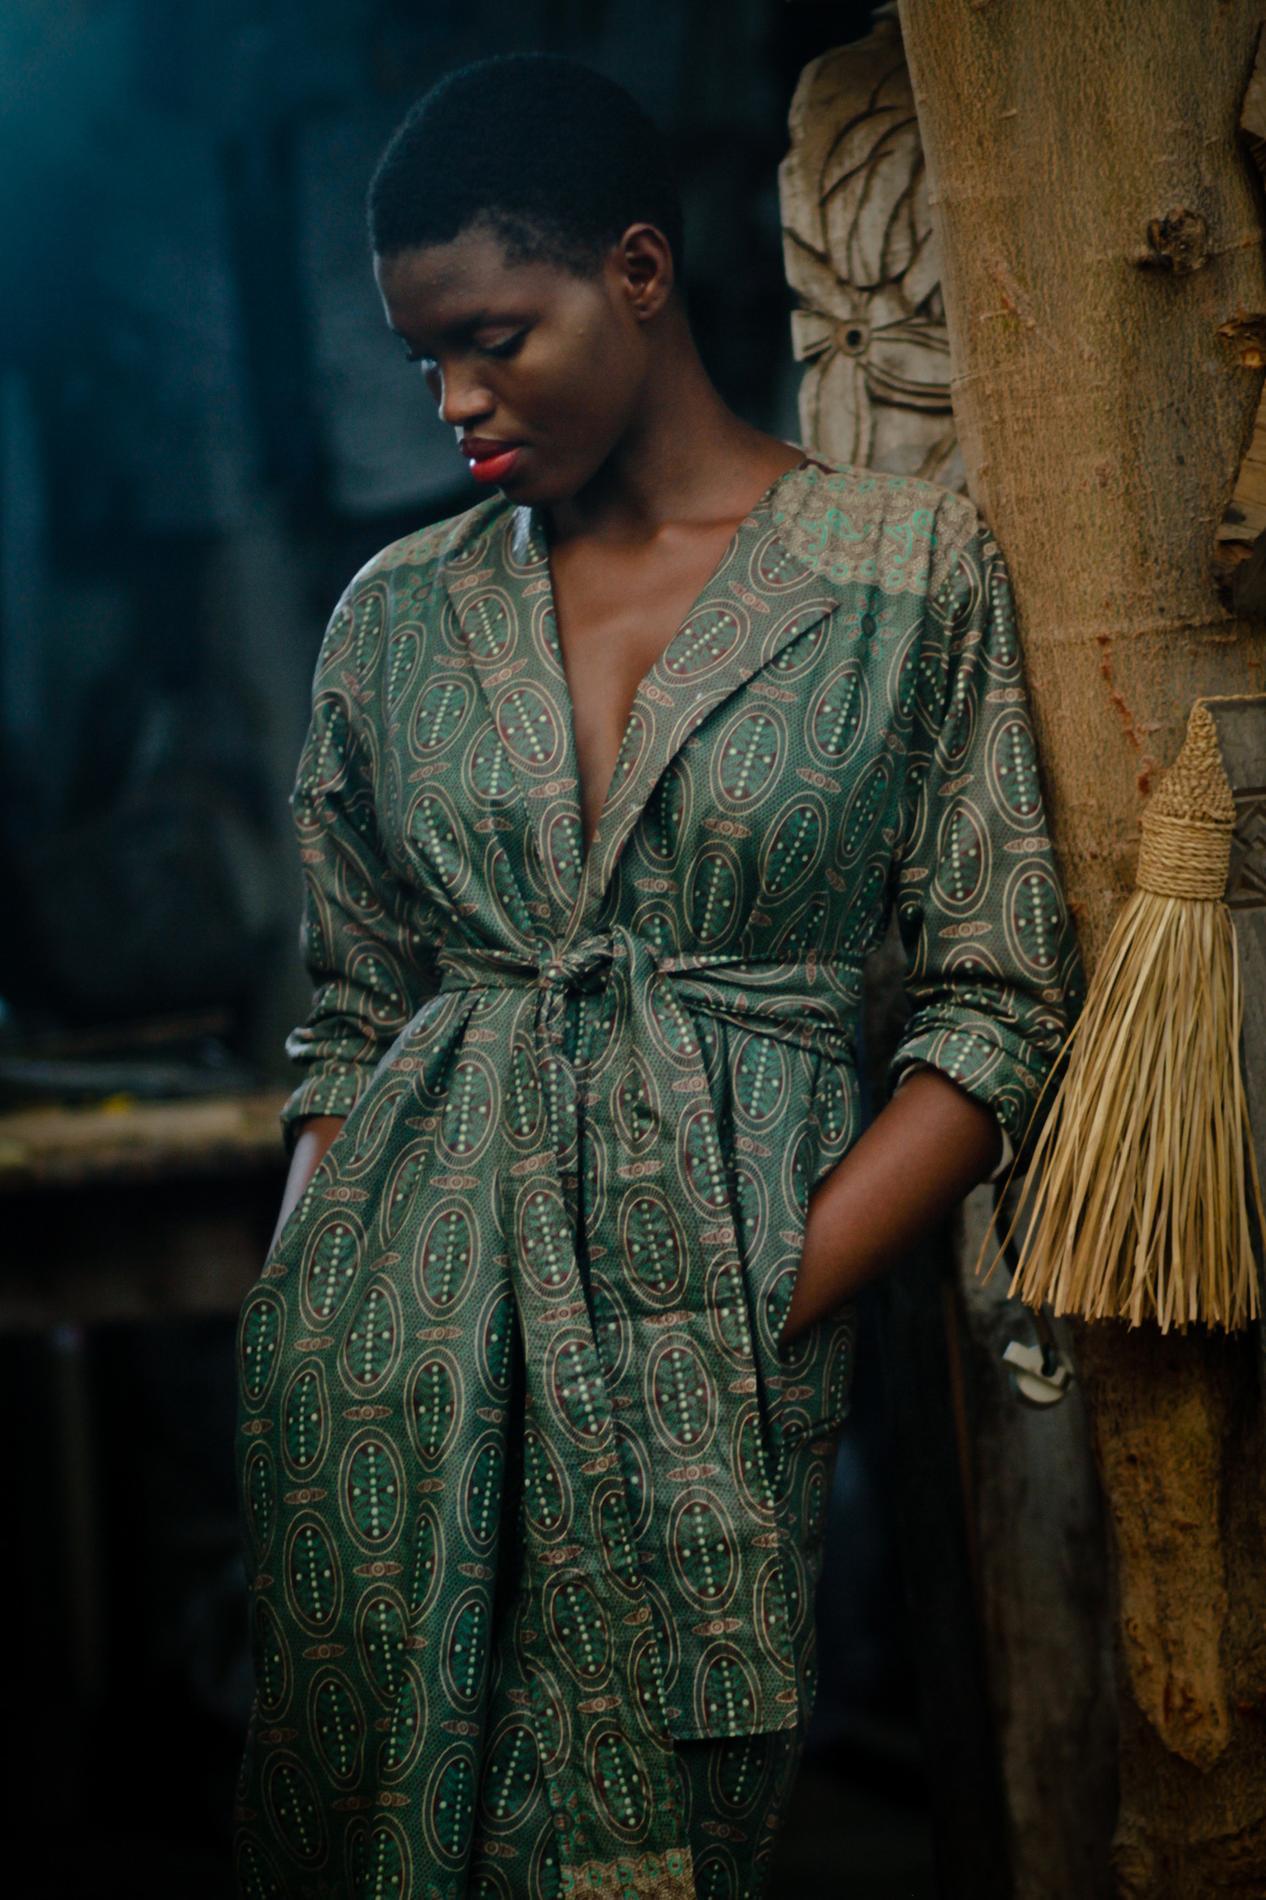 les jeunes cr ateurs qui font briller la mode africaine madame figaro. Black Bedroom Furniture Sets. Home Design Ideas